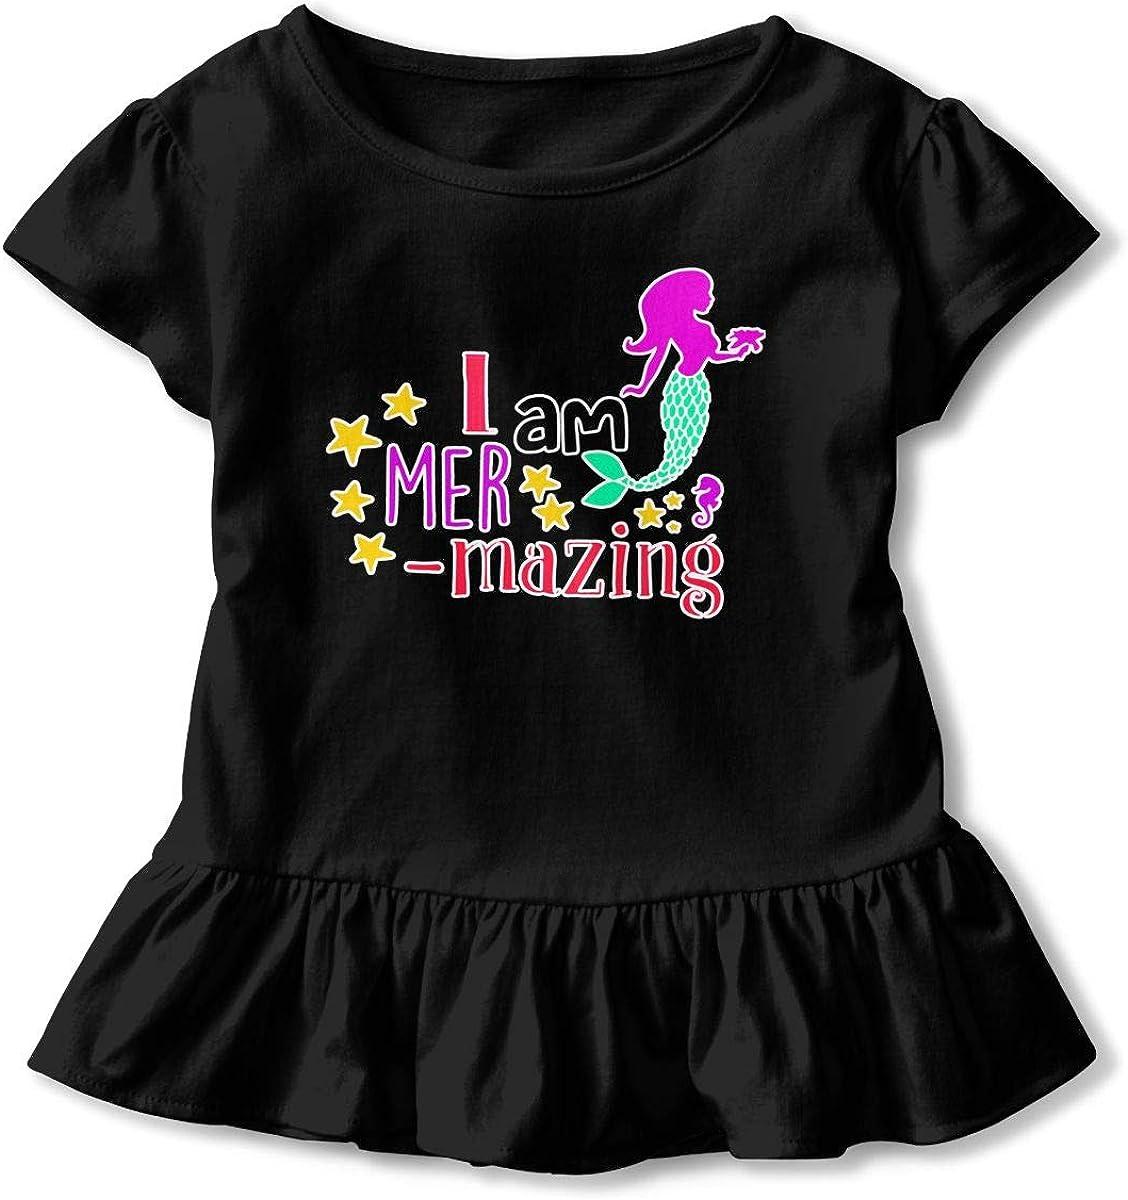 Charming Mermaids Baby Skirts Adorable Kids T Shirt Dress Soft Flounces Jumpsuit